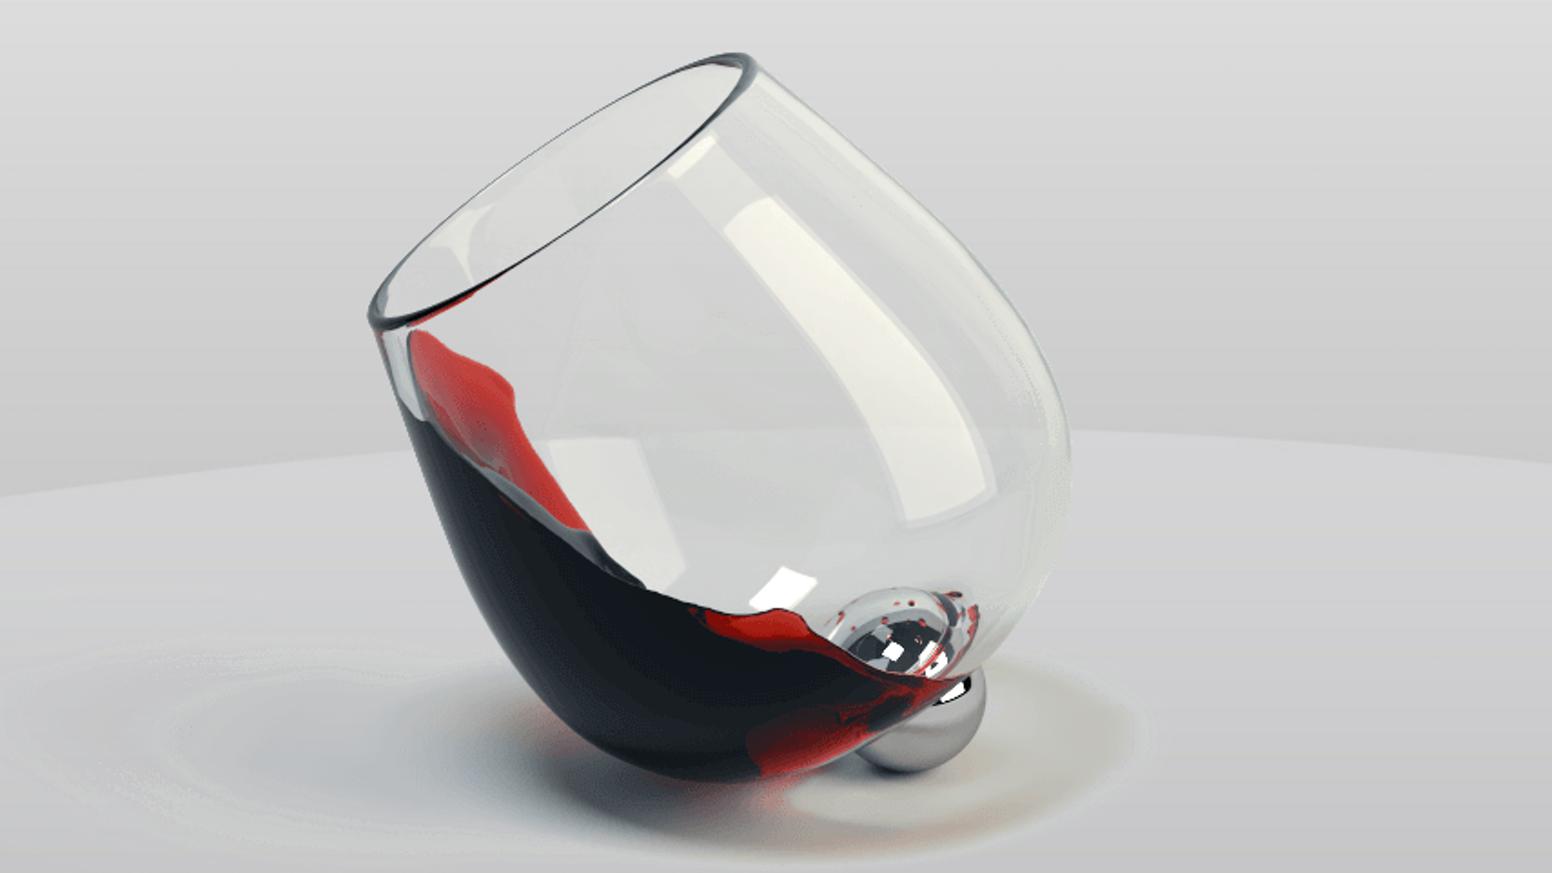 #5 Non-Spill Glasses